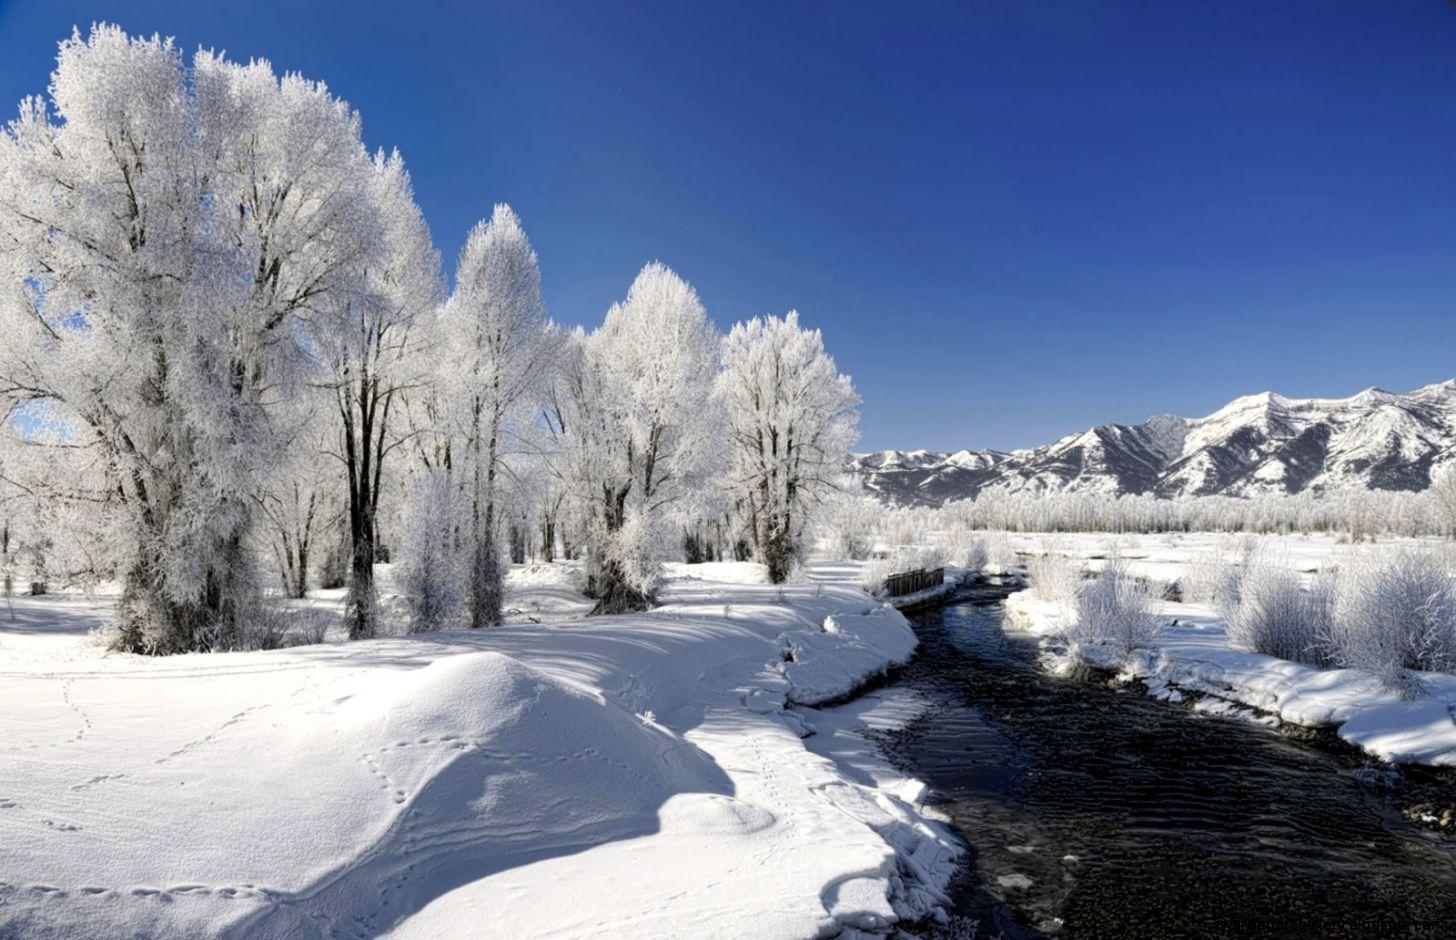 Winter Season Desktop Wallpaper